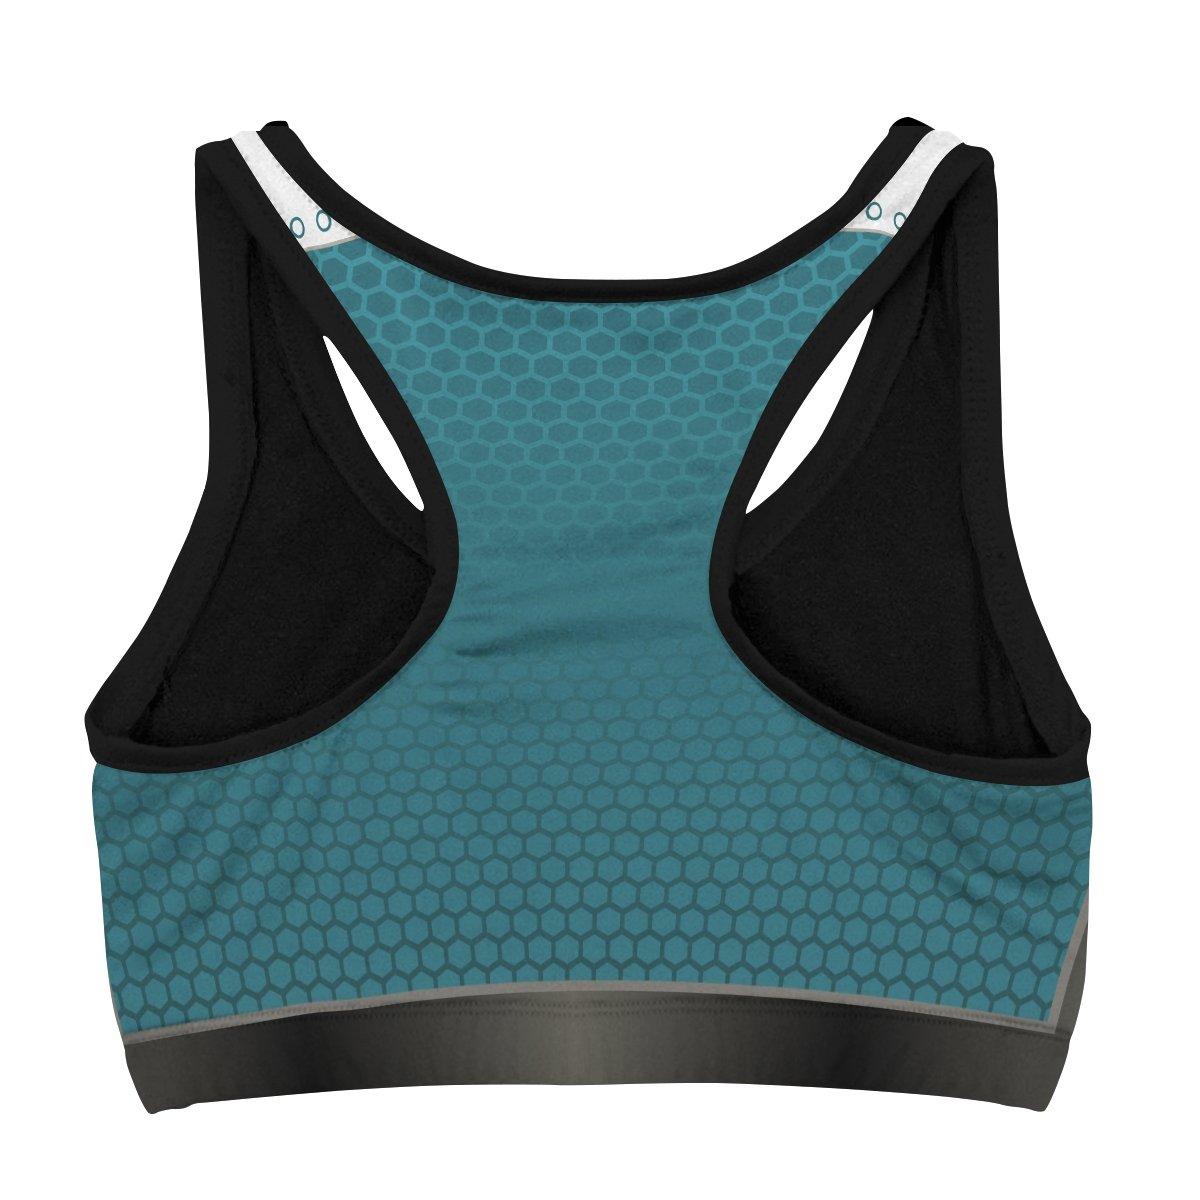 ua high izuku active wear set 460597 - Anime Swimsuits